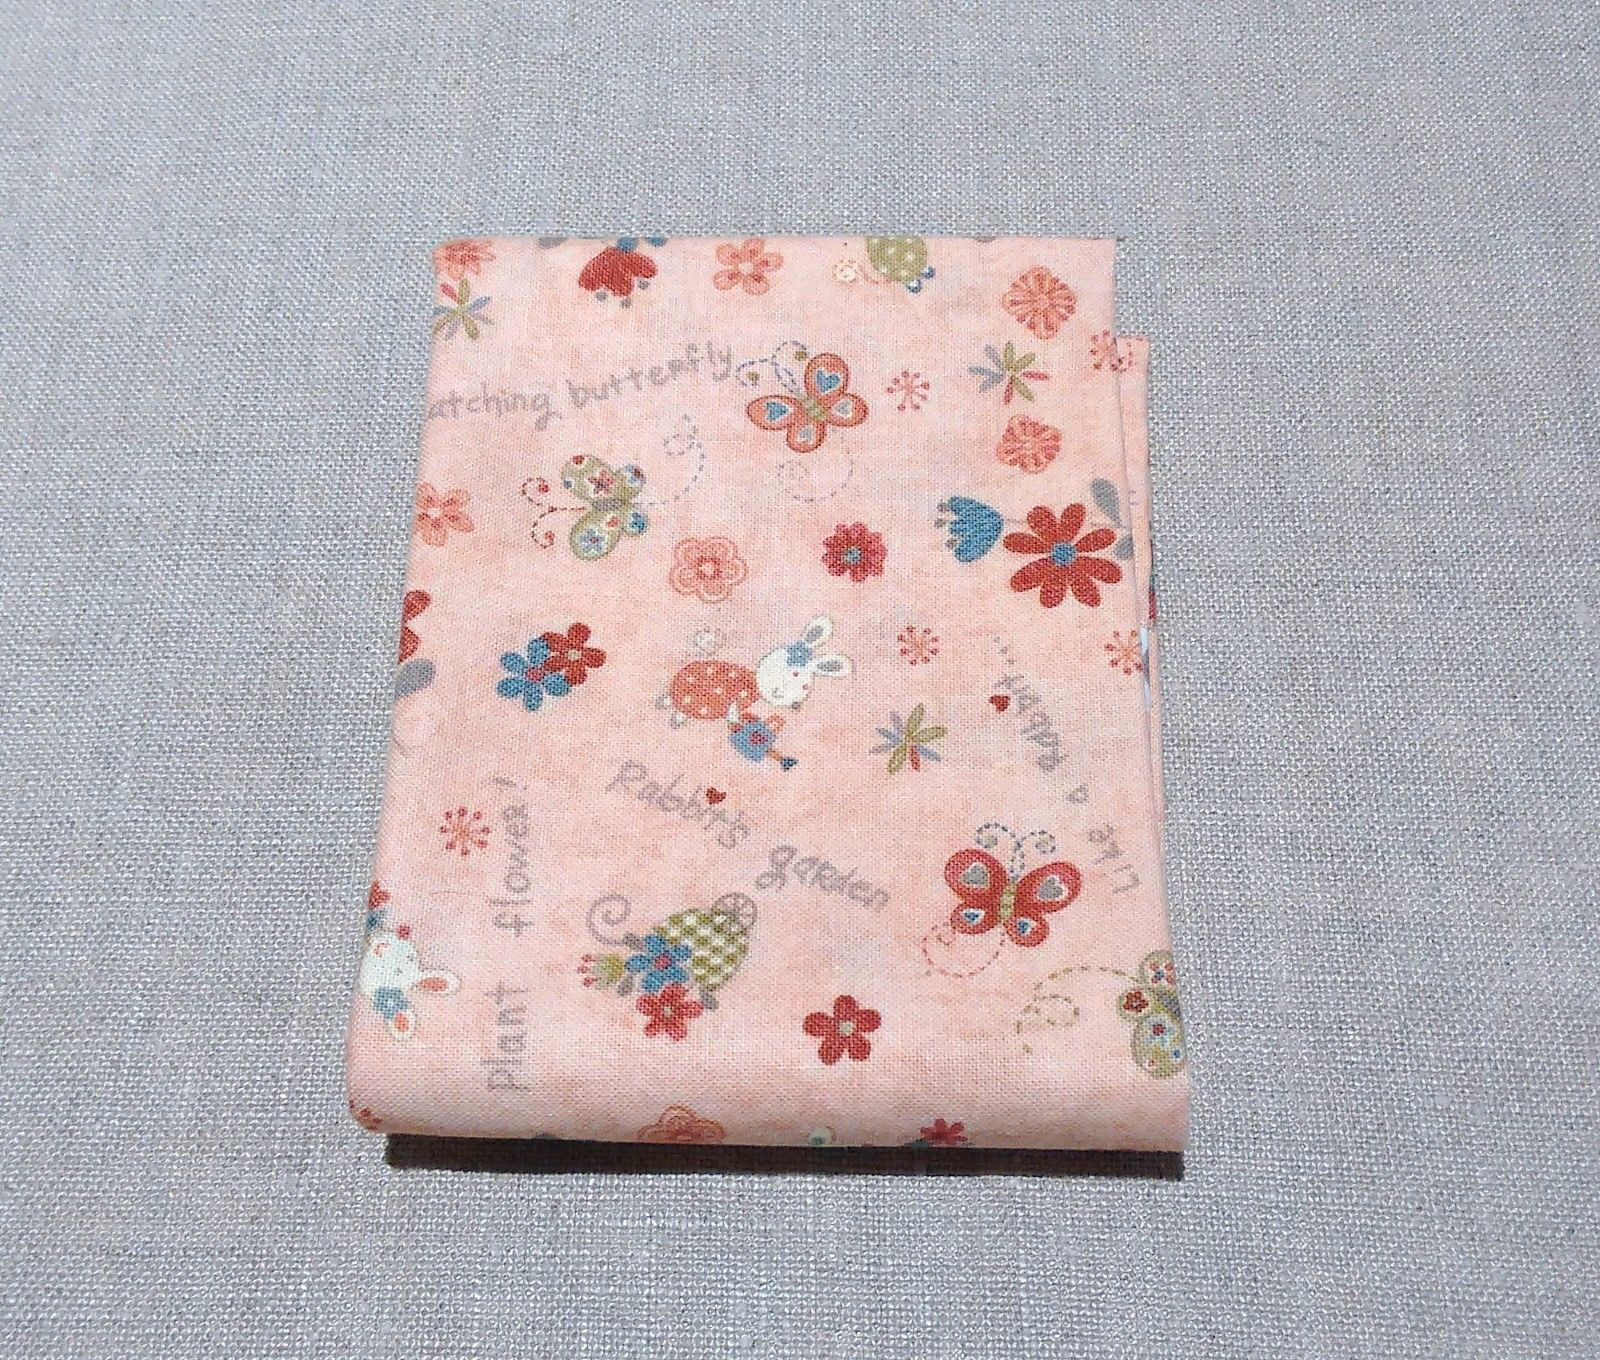 Tessuti patchwork pois rose cotone americano Henry Glass quilt cm 25x110